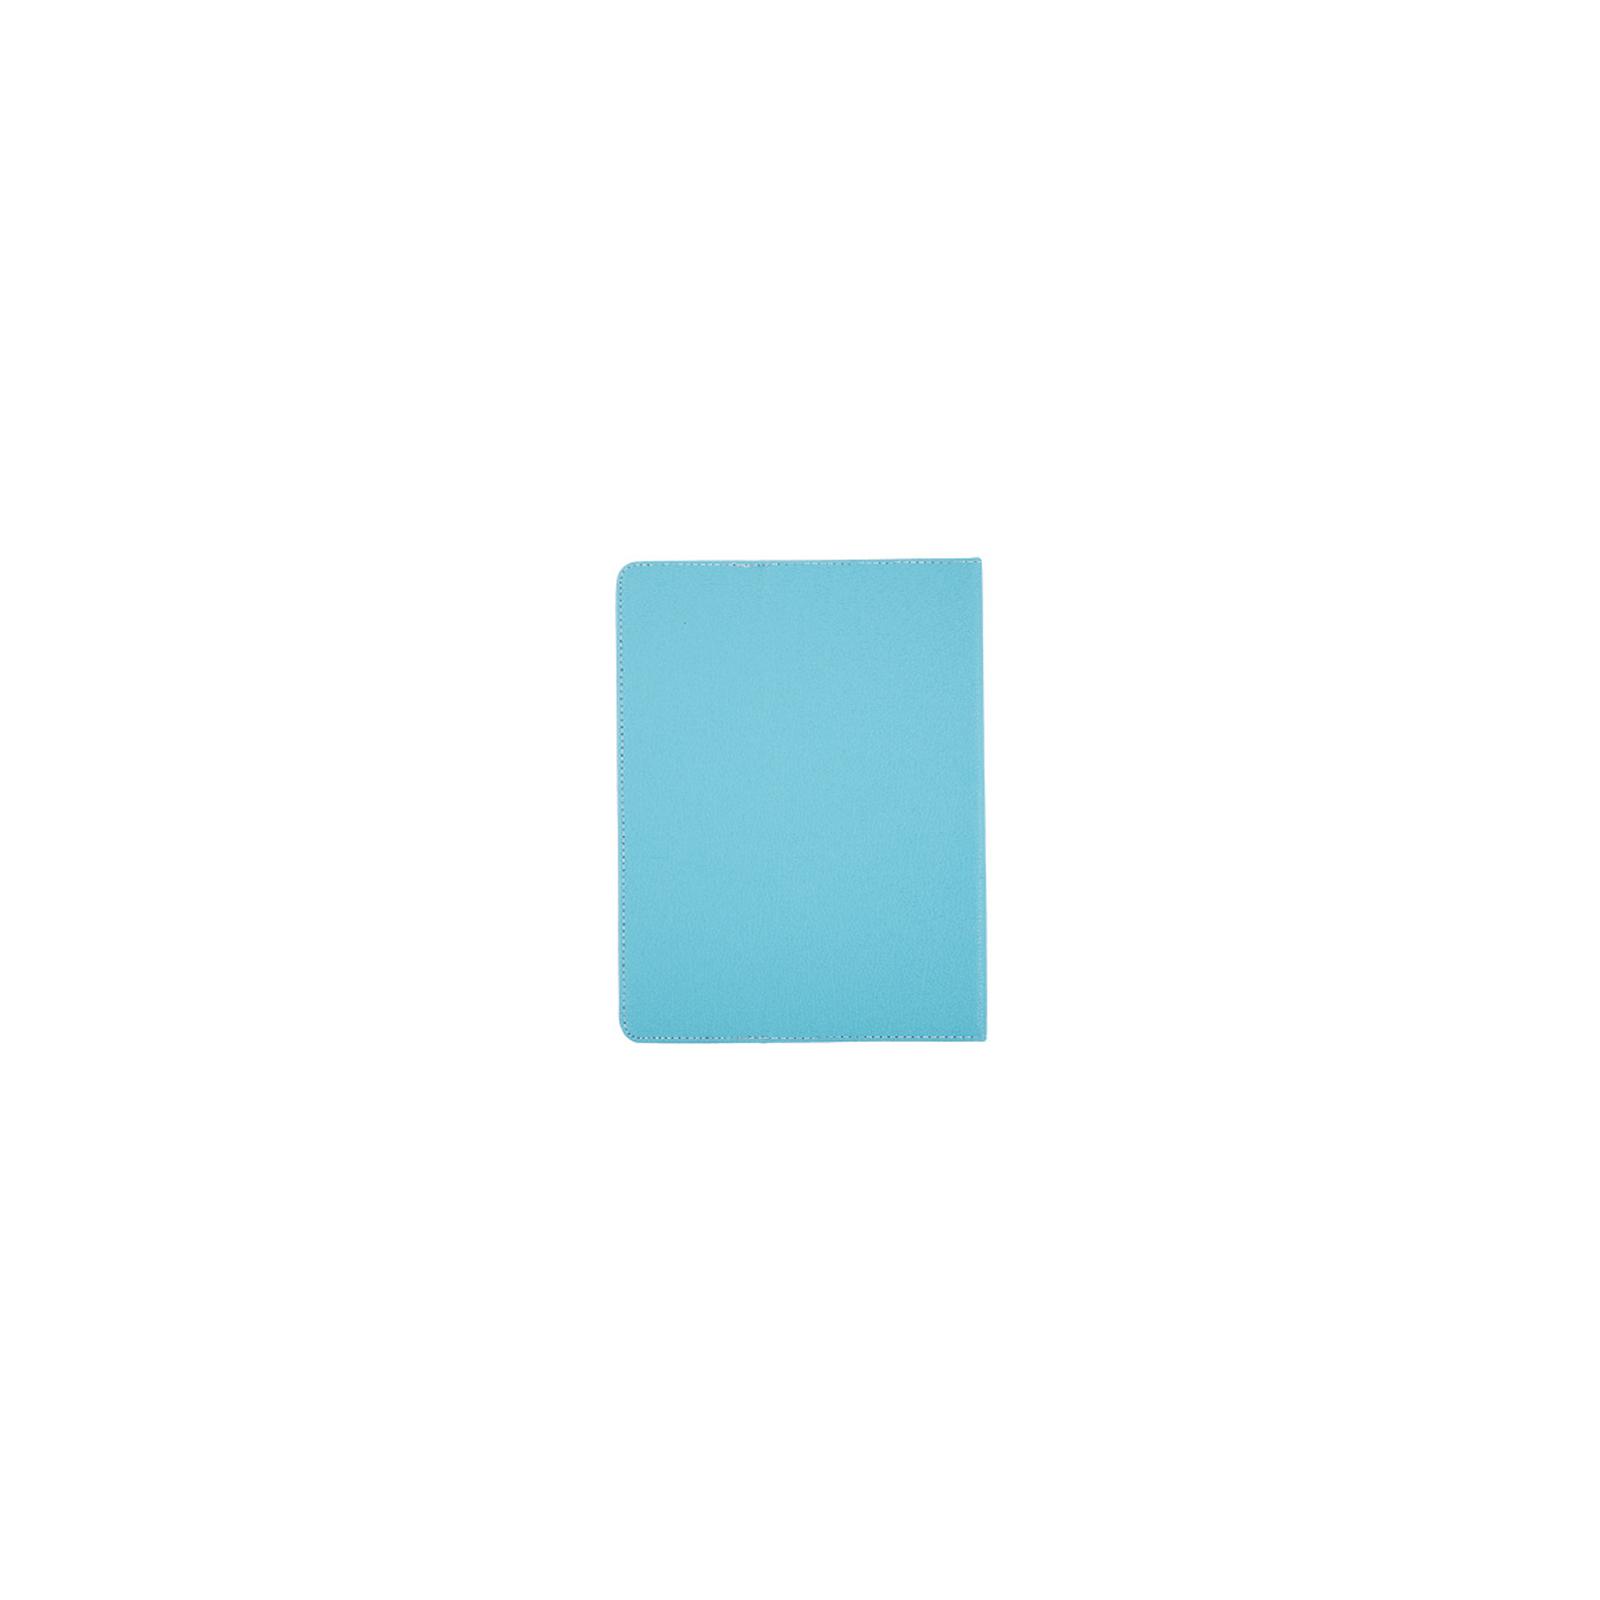 "Чехол для планшета Drobak 10""-10.1"" Universal Stand Blue (216885) изображение 2"